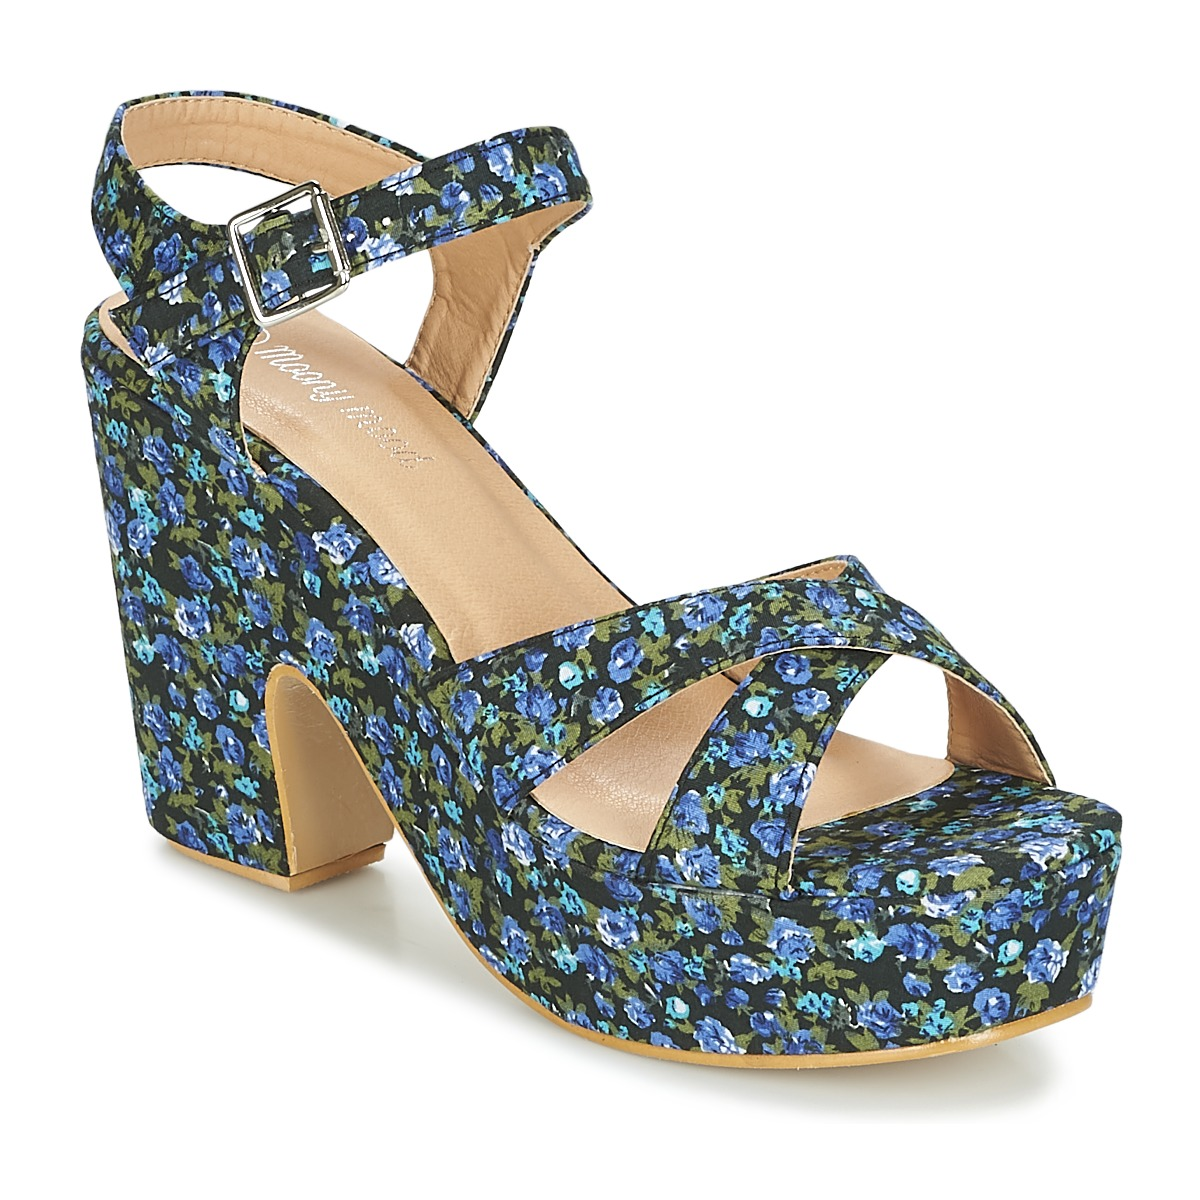 Moony Mood INADA Blau - Kostenloser Versand bei Spartoode ! - Schuhe Sandalen / Sandaletten Damen 29,99 €